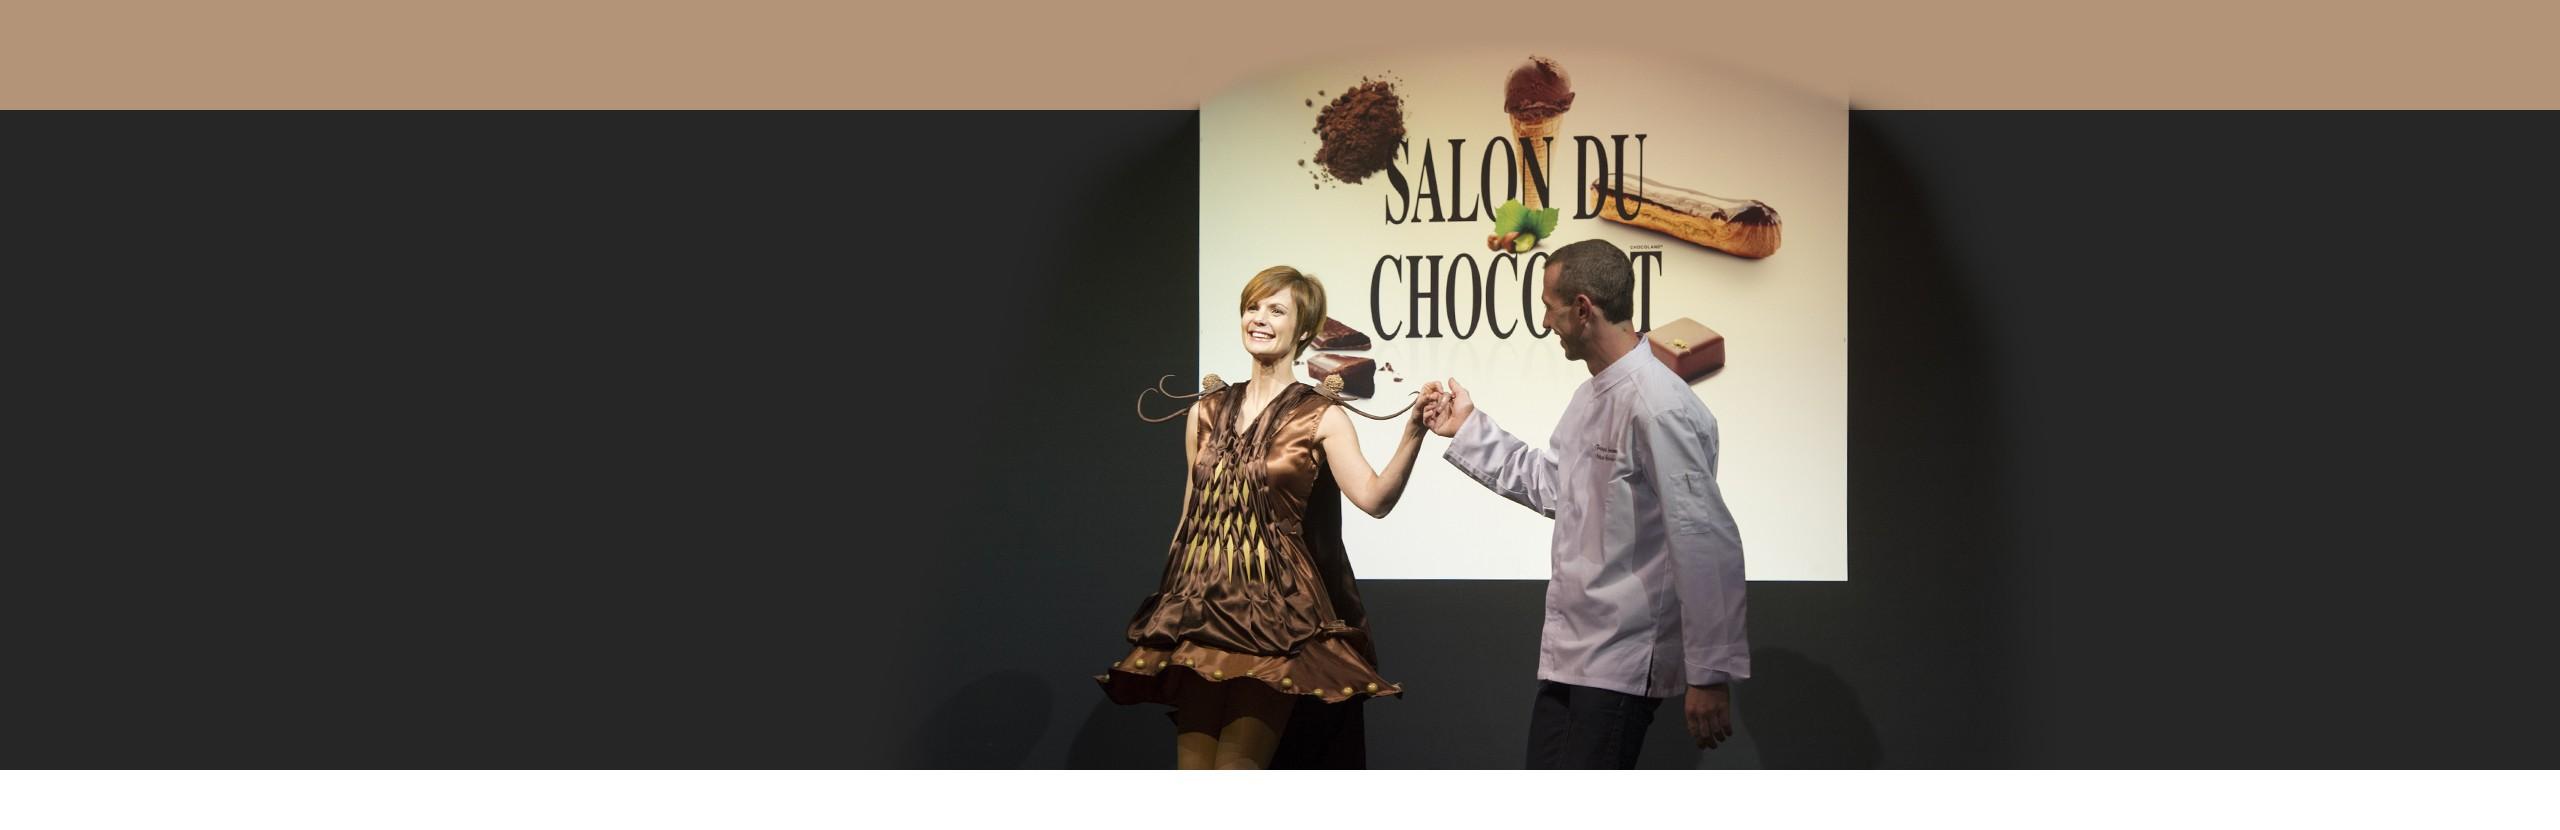 Chocolate Show 2014